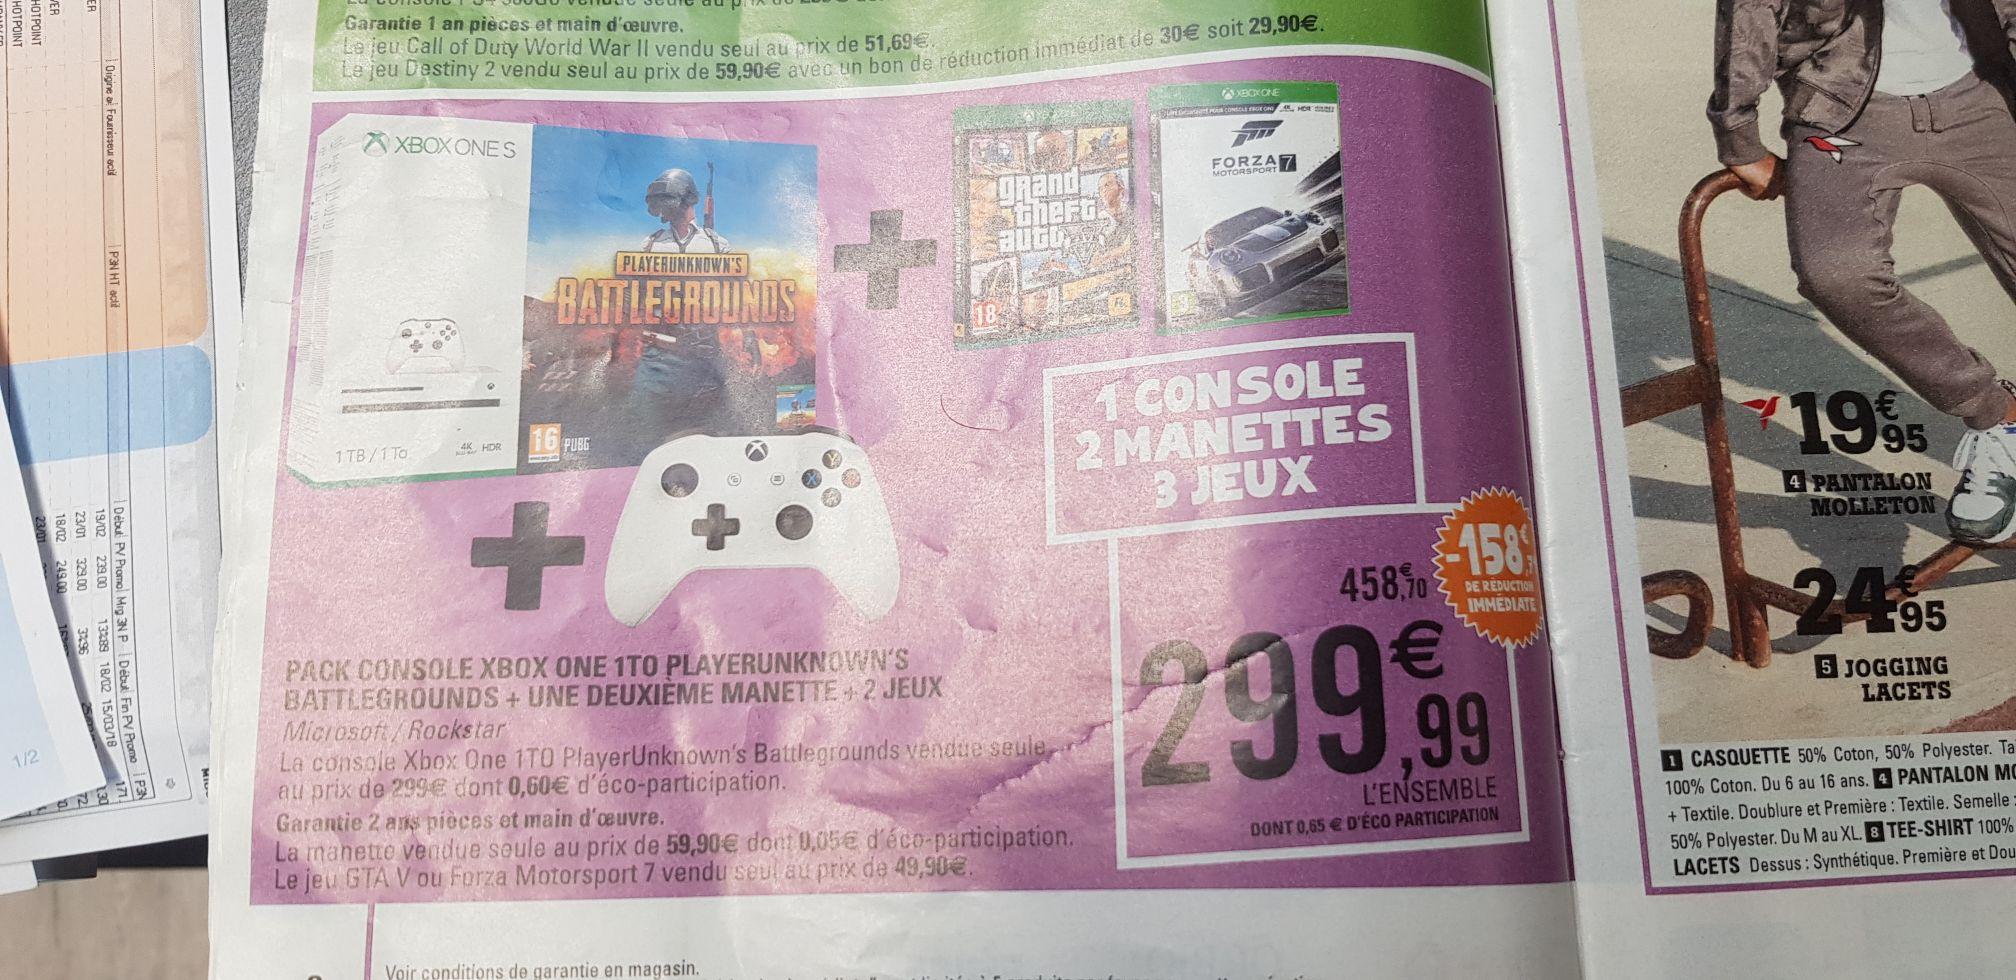 Pack Console Xbox One S 1To PUBG + deuxième manette + Forza 7 + GTA 5